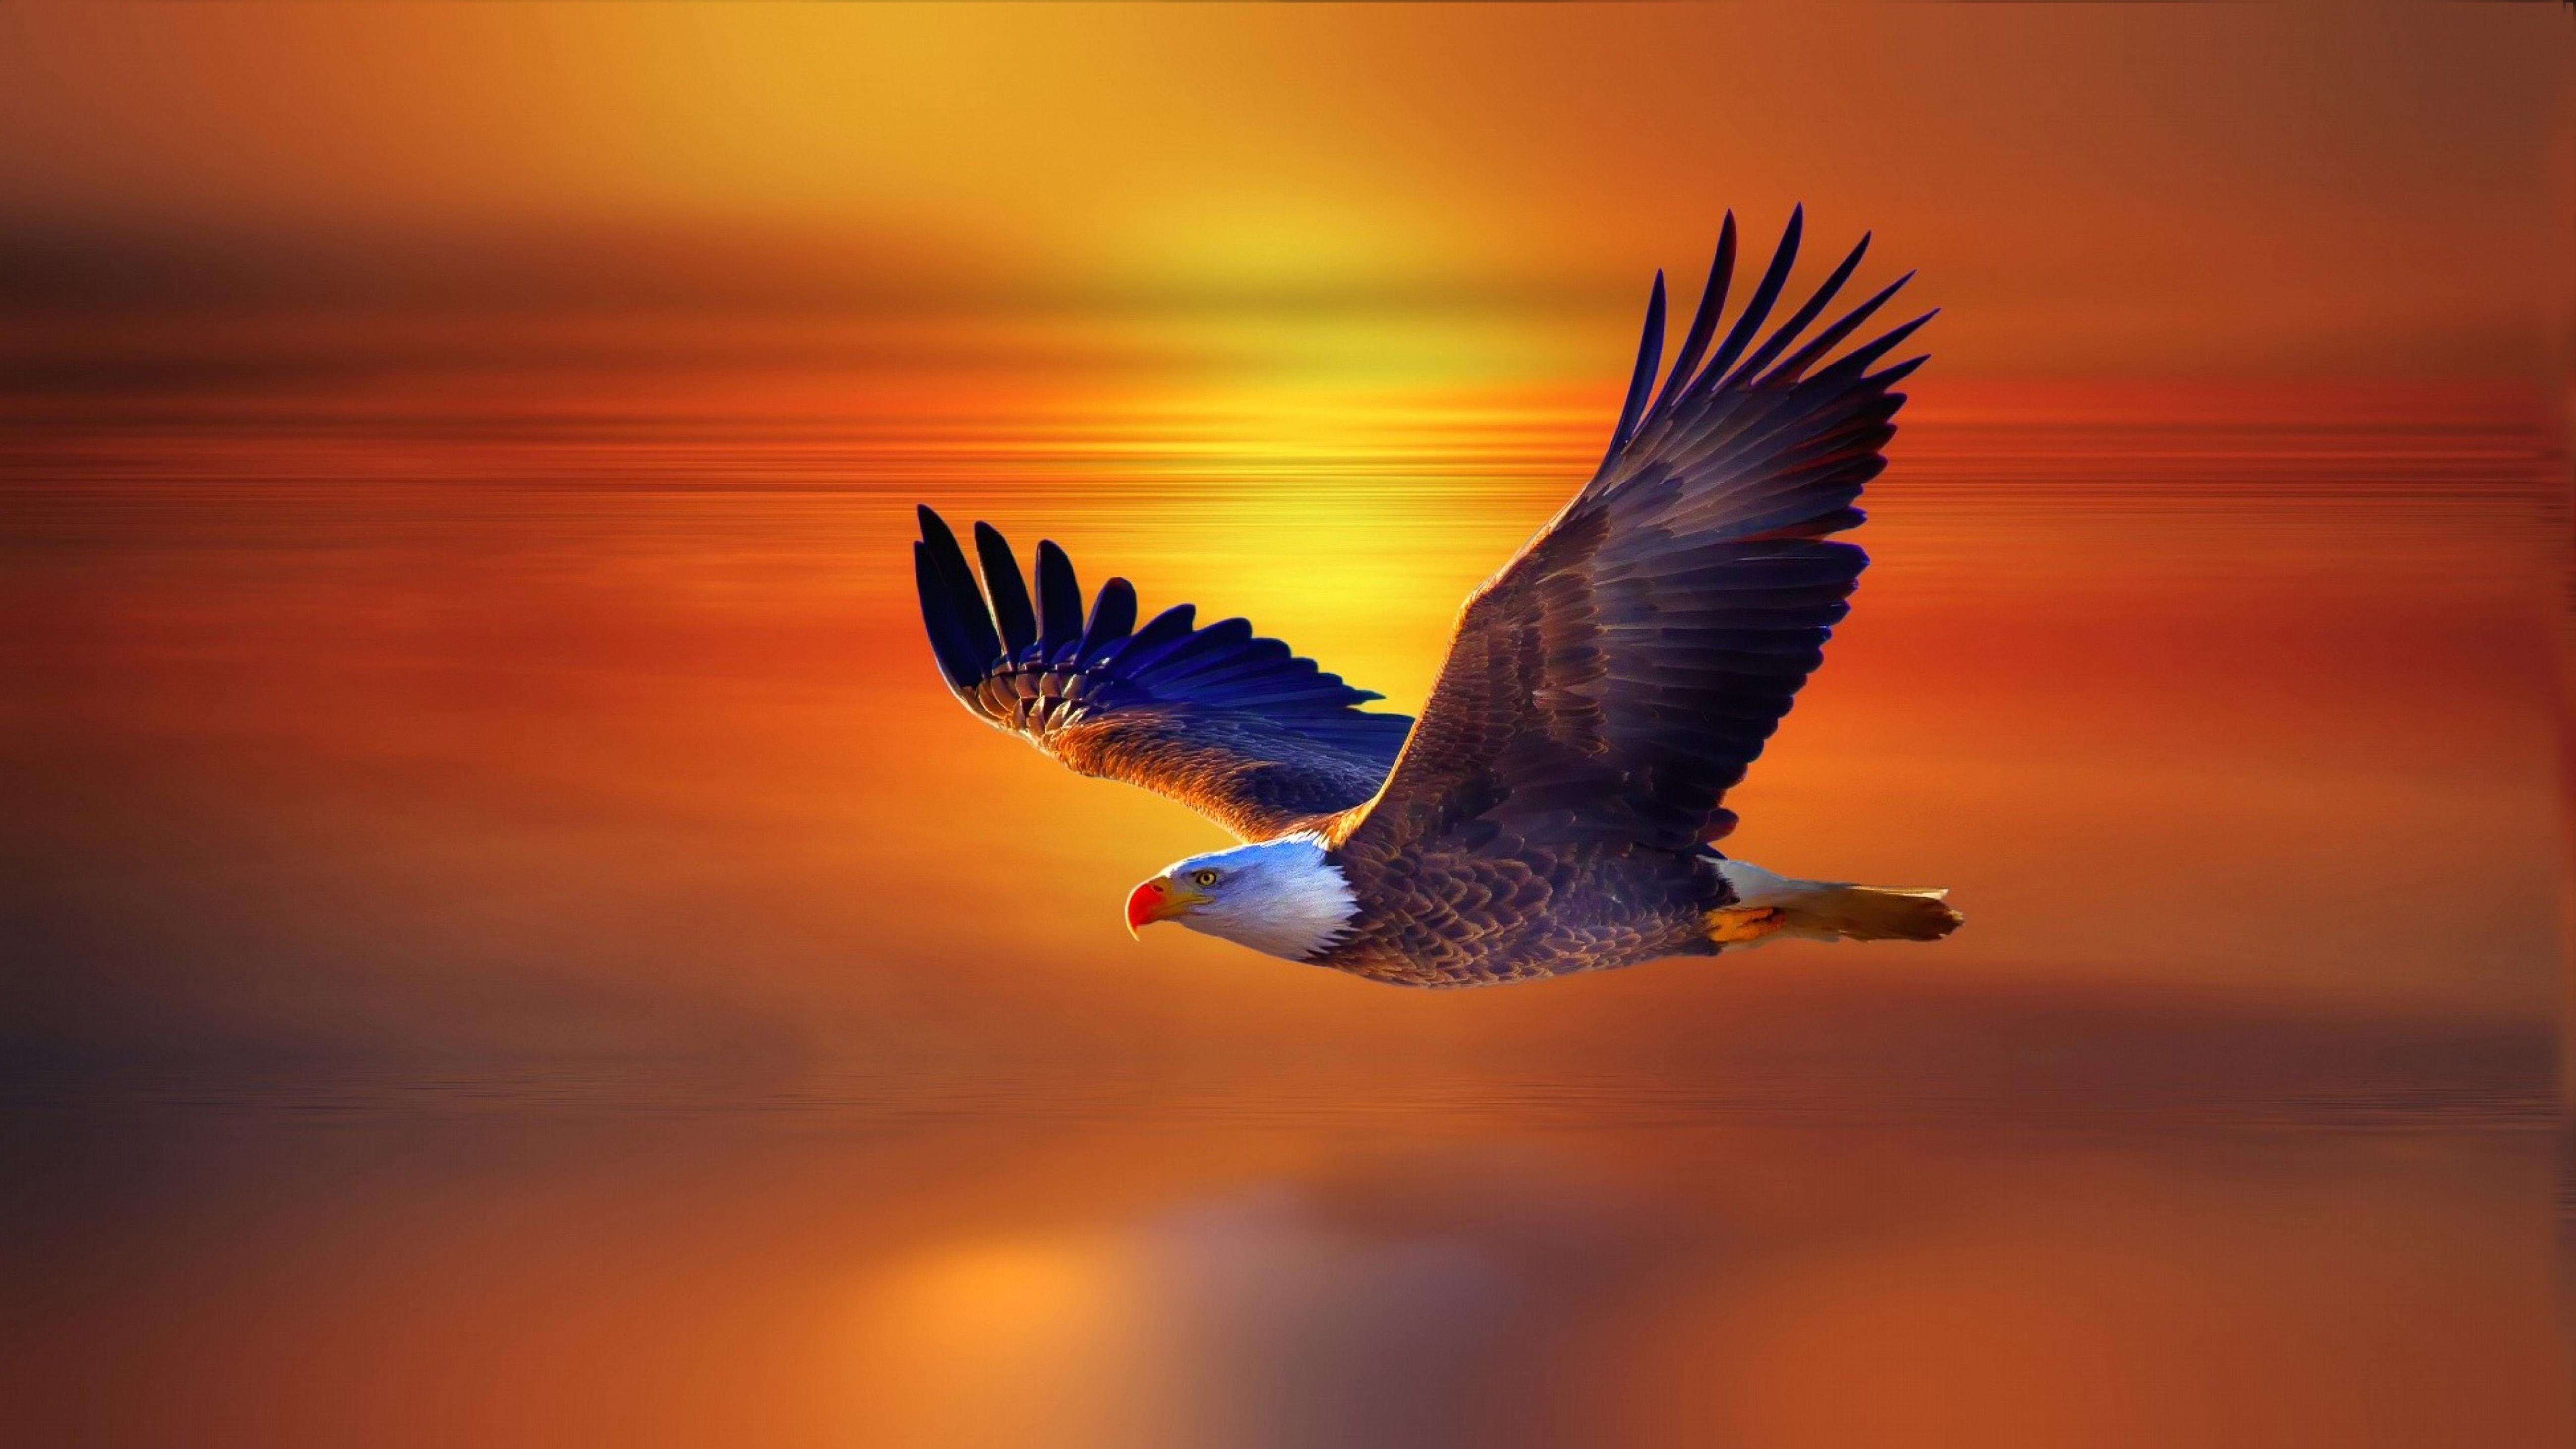 Philadelphia Iphone 5 Hd Eagles Wallpapers